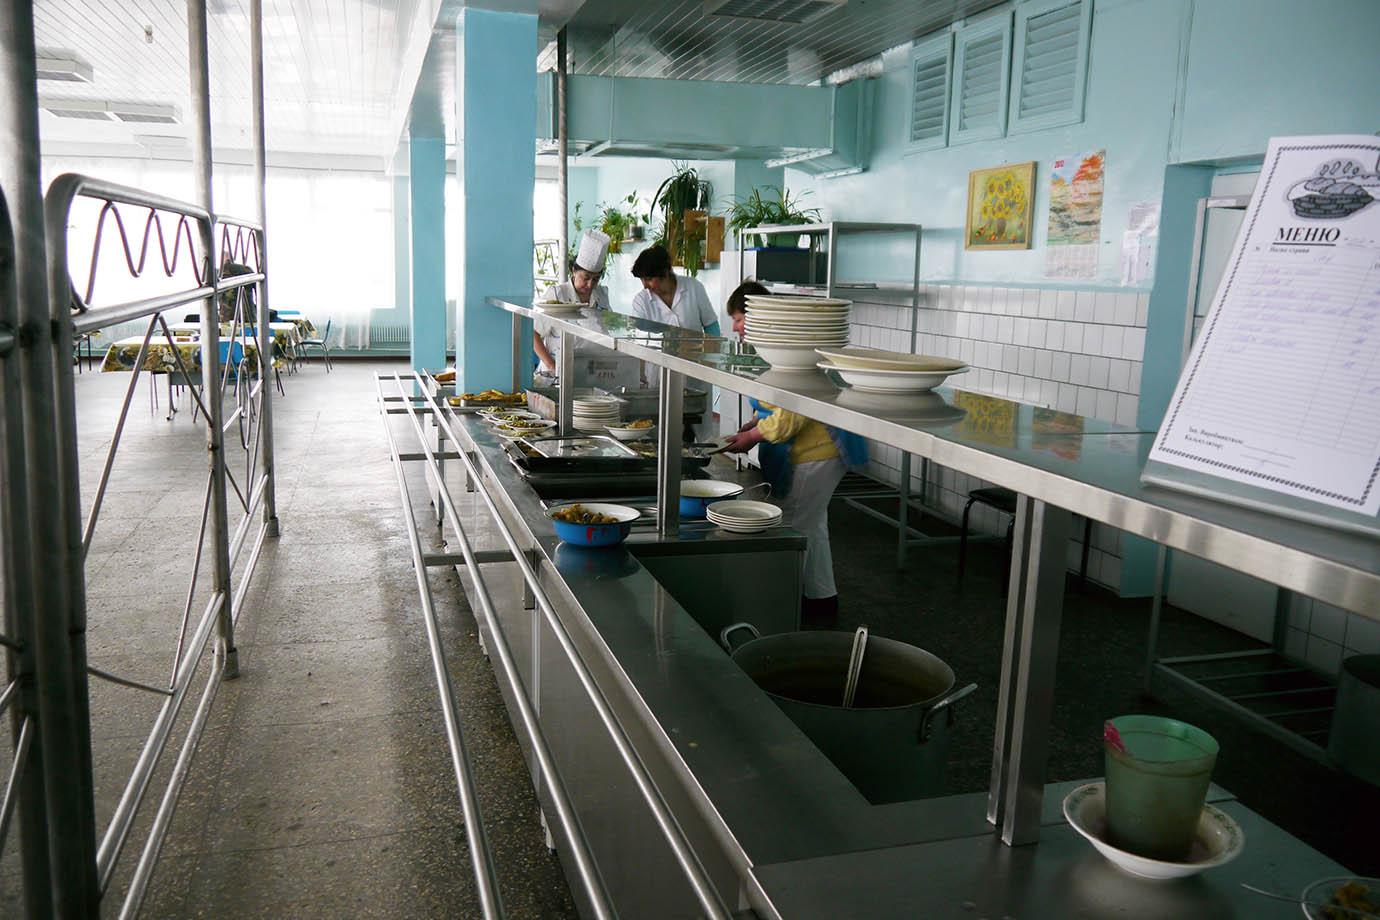 chernobyl-cafeteria10